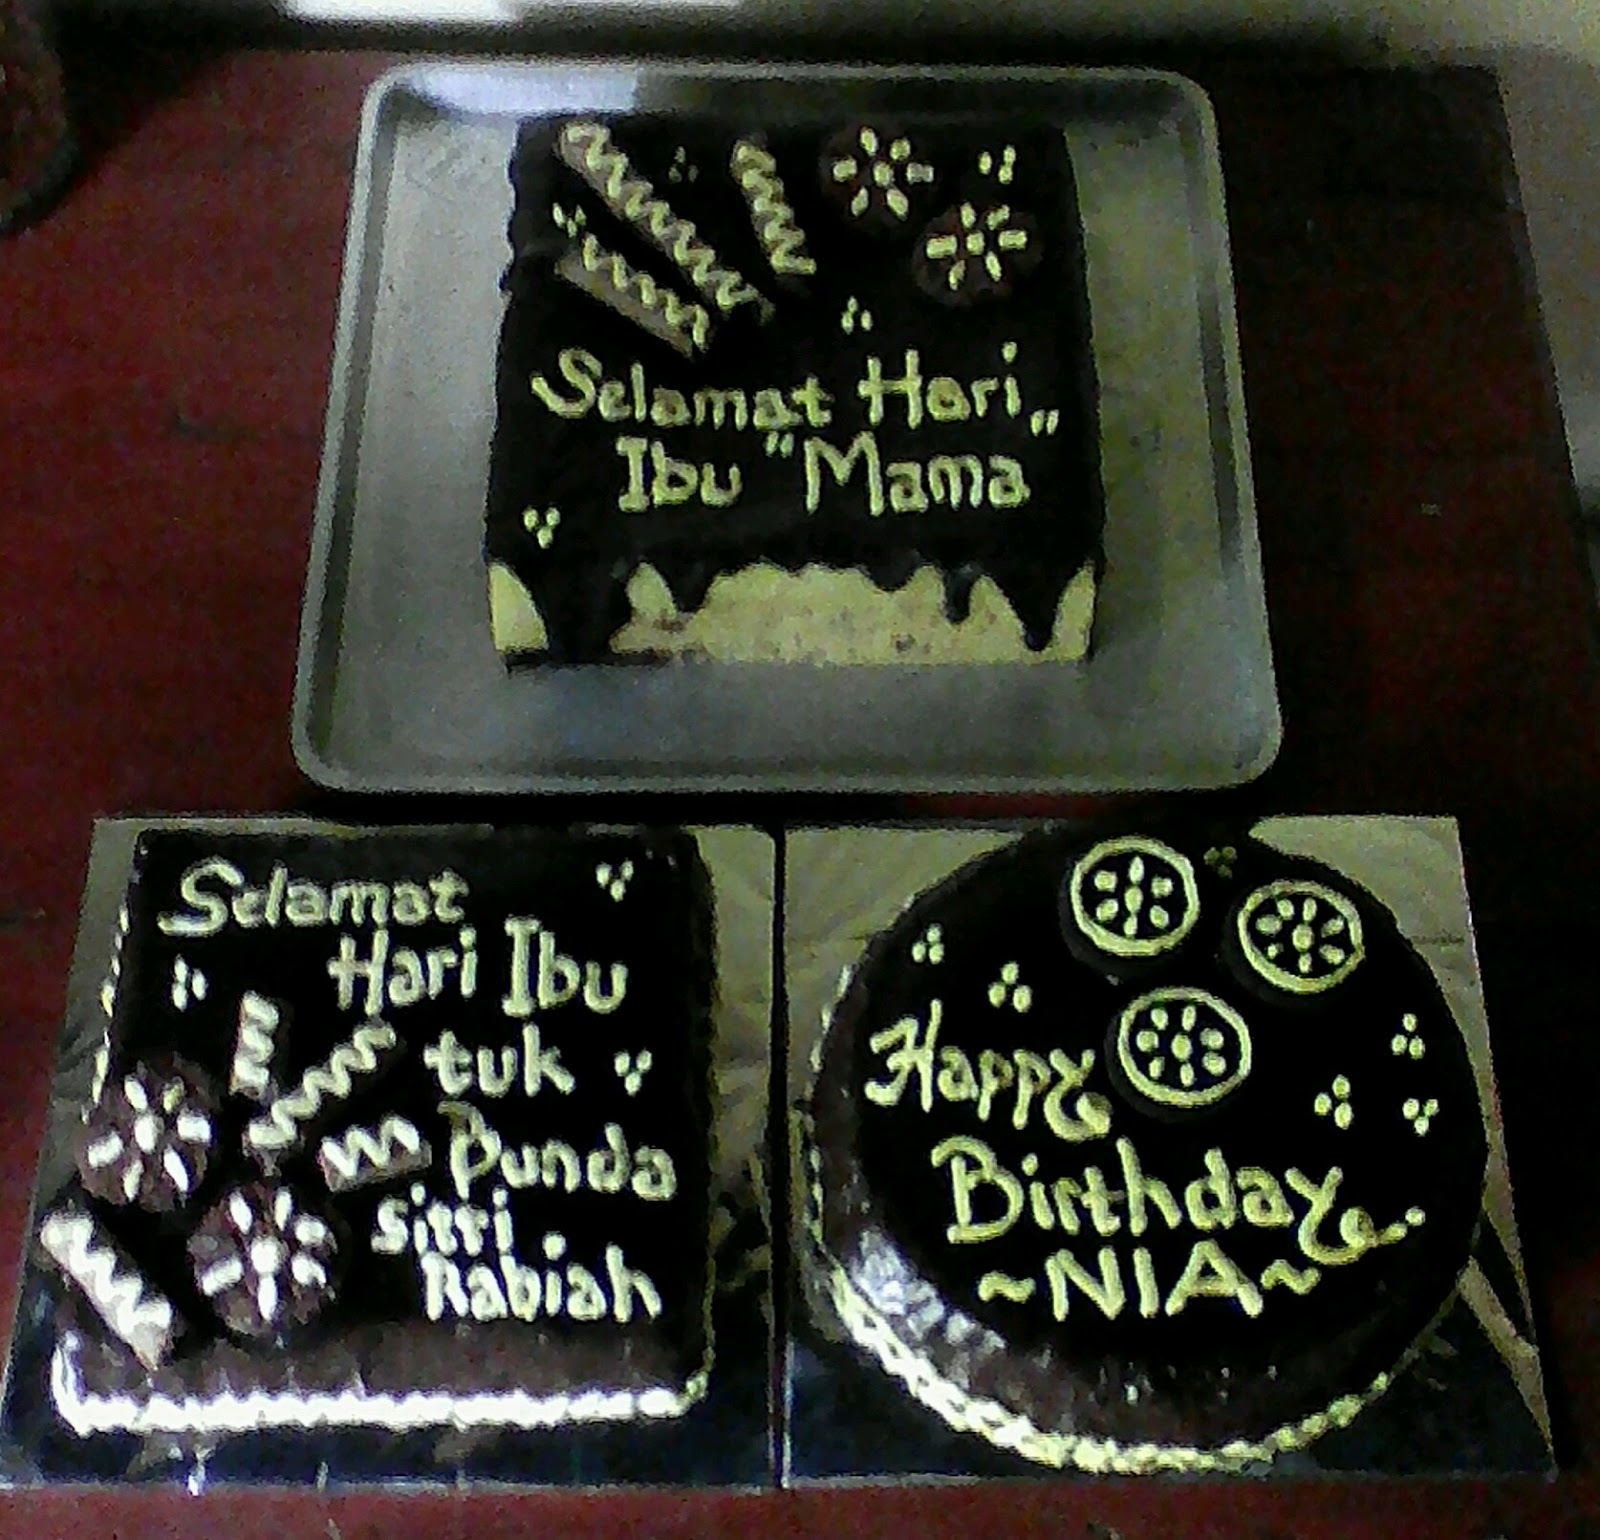 Jualan Kue Ulang Tahun 11 Dan Kue Hari Ibu